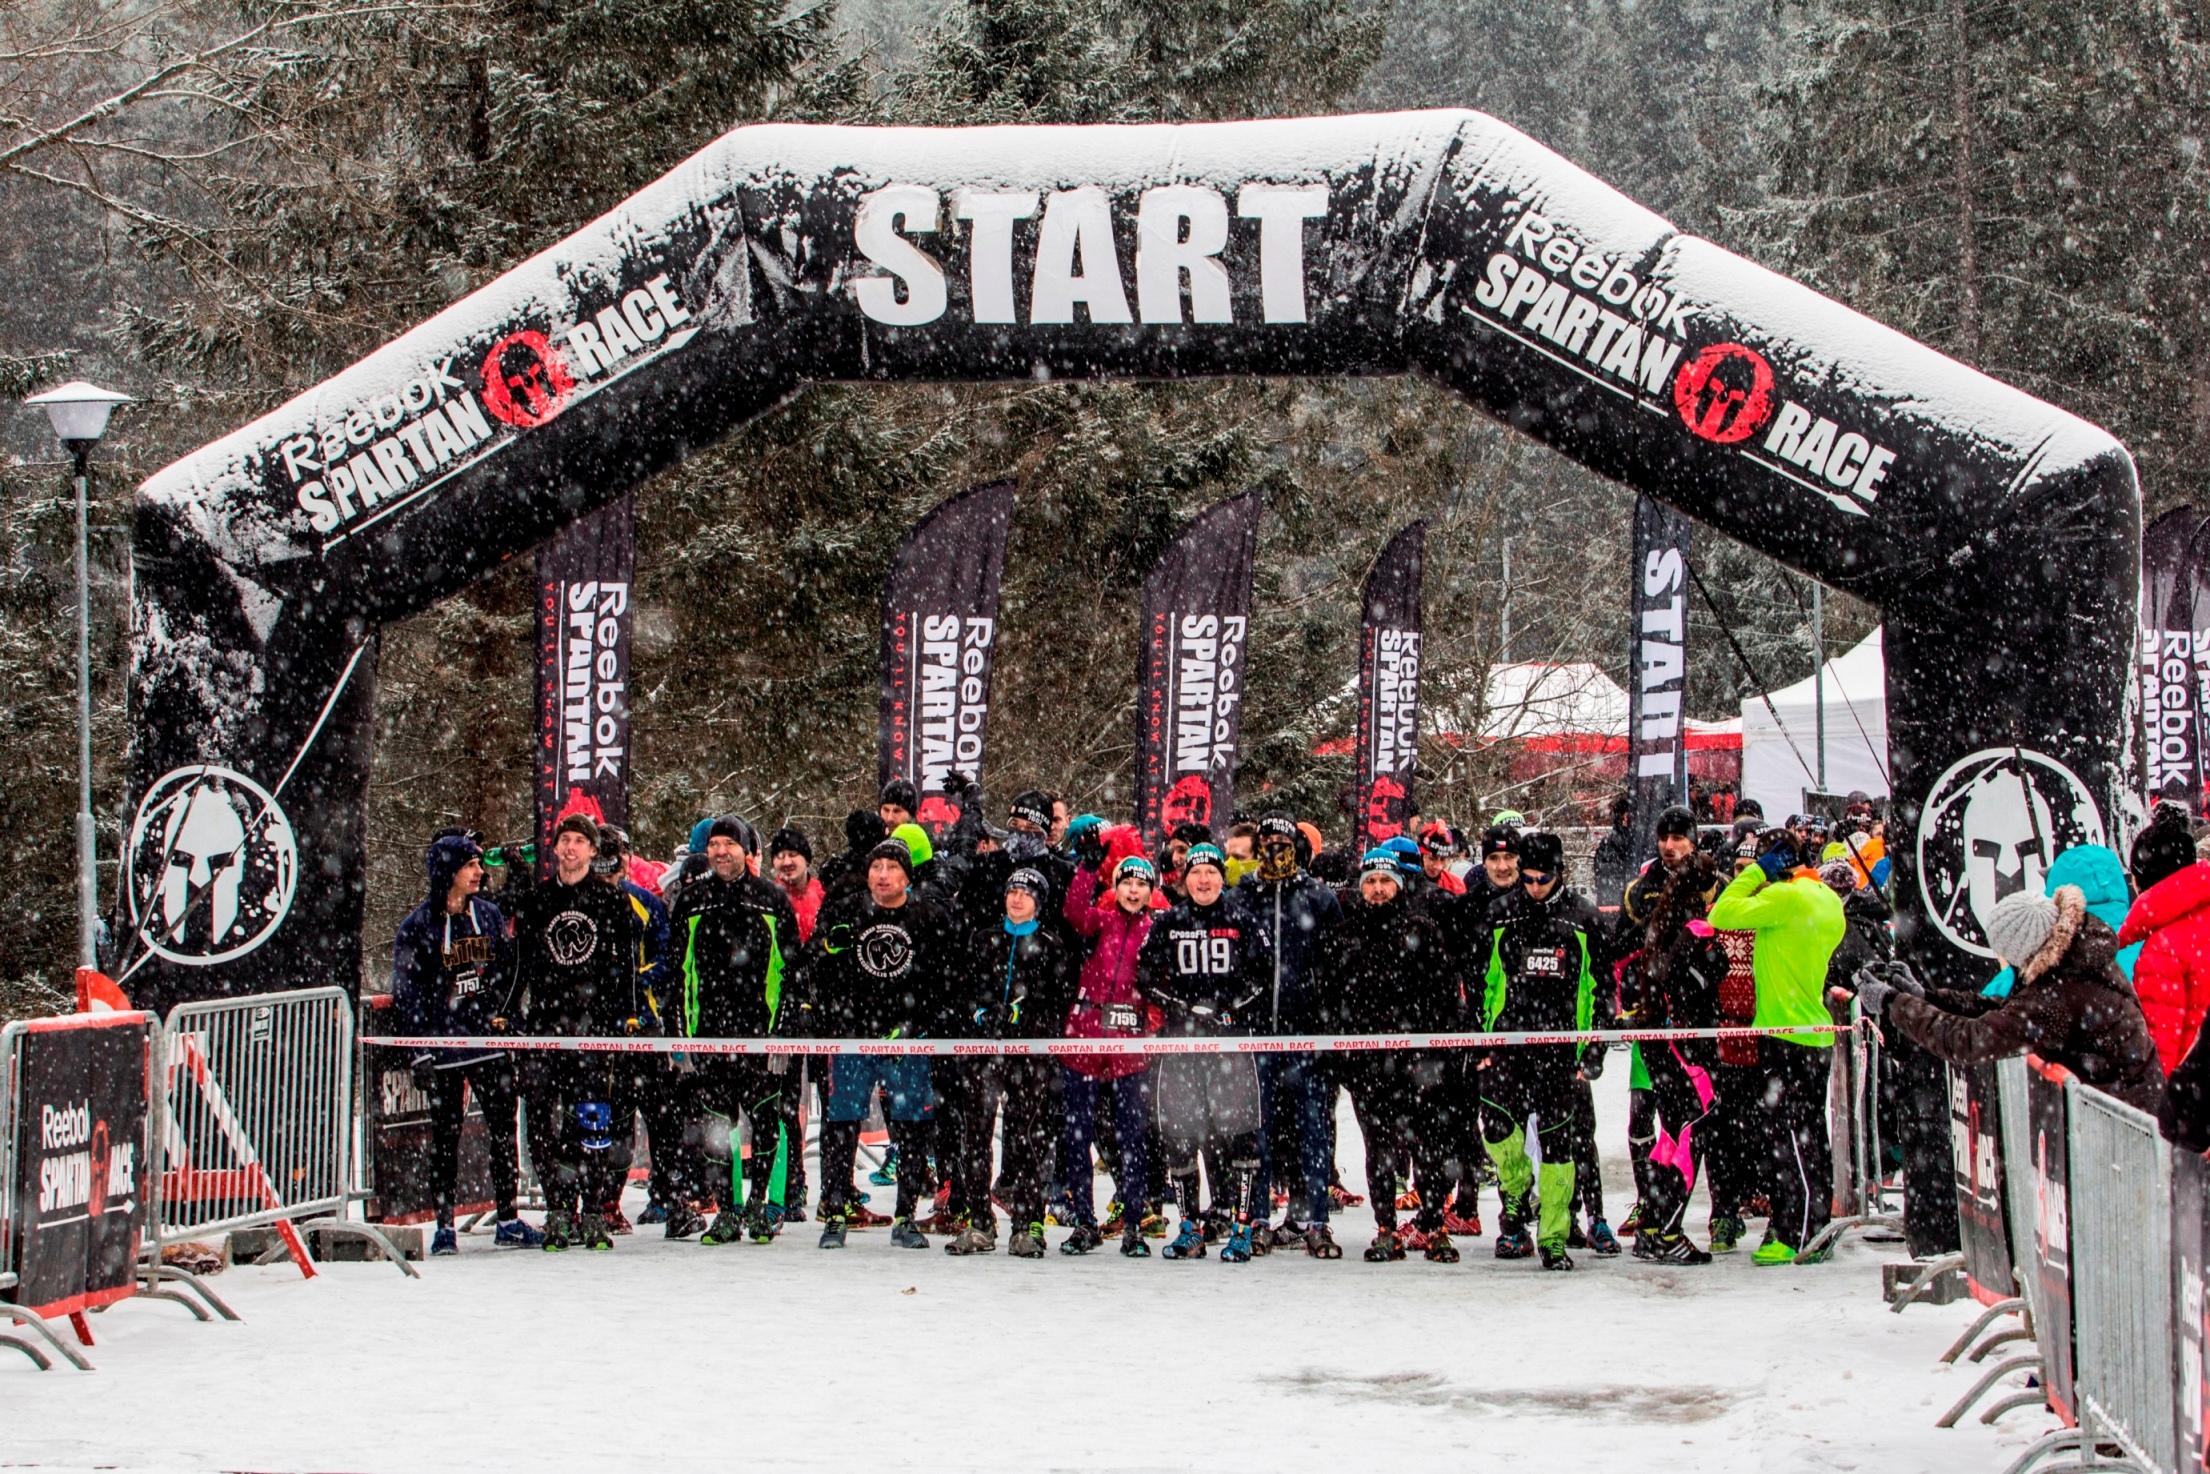 Winter Sprint Spartan Race vo Svite už č - Katalóg firiem  fbf937f9f1b